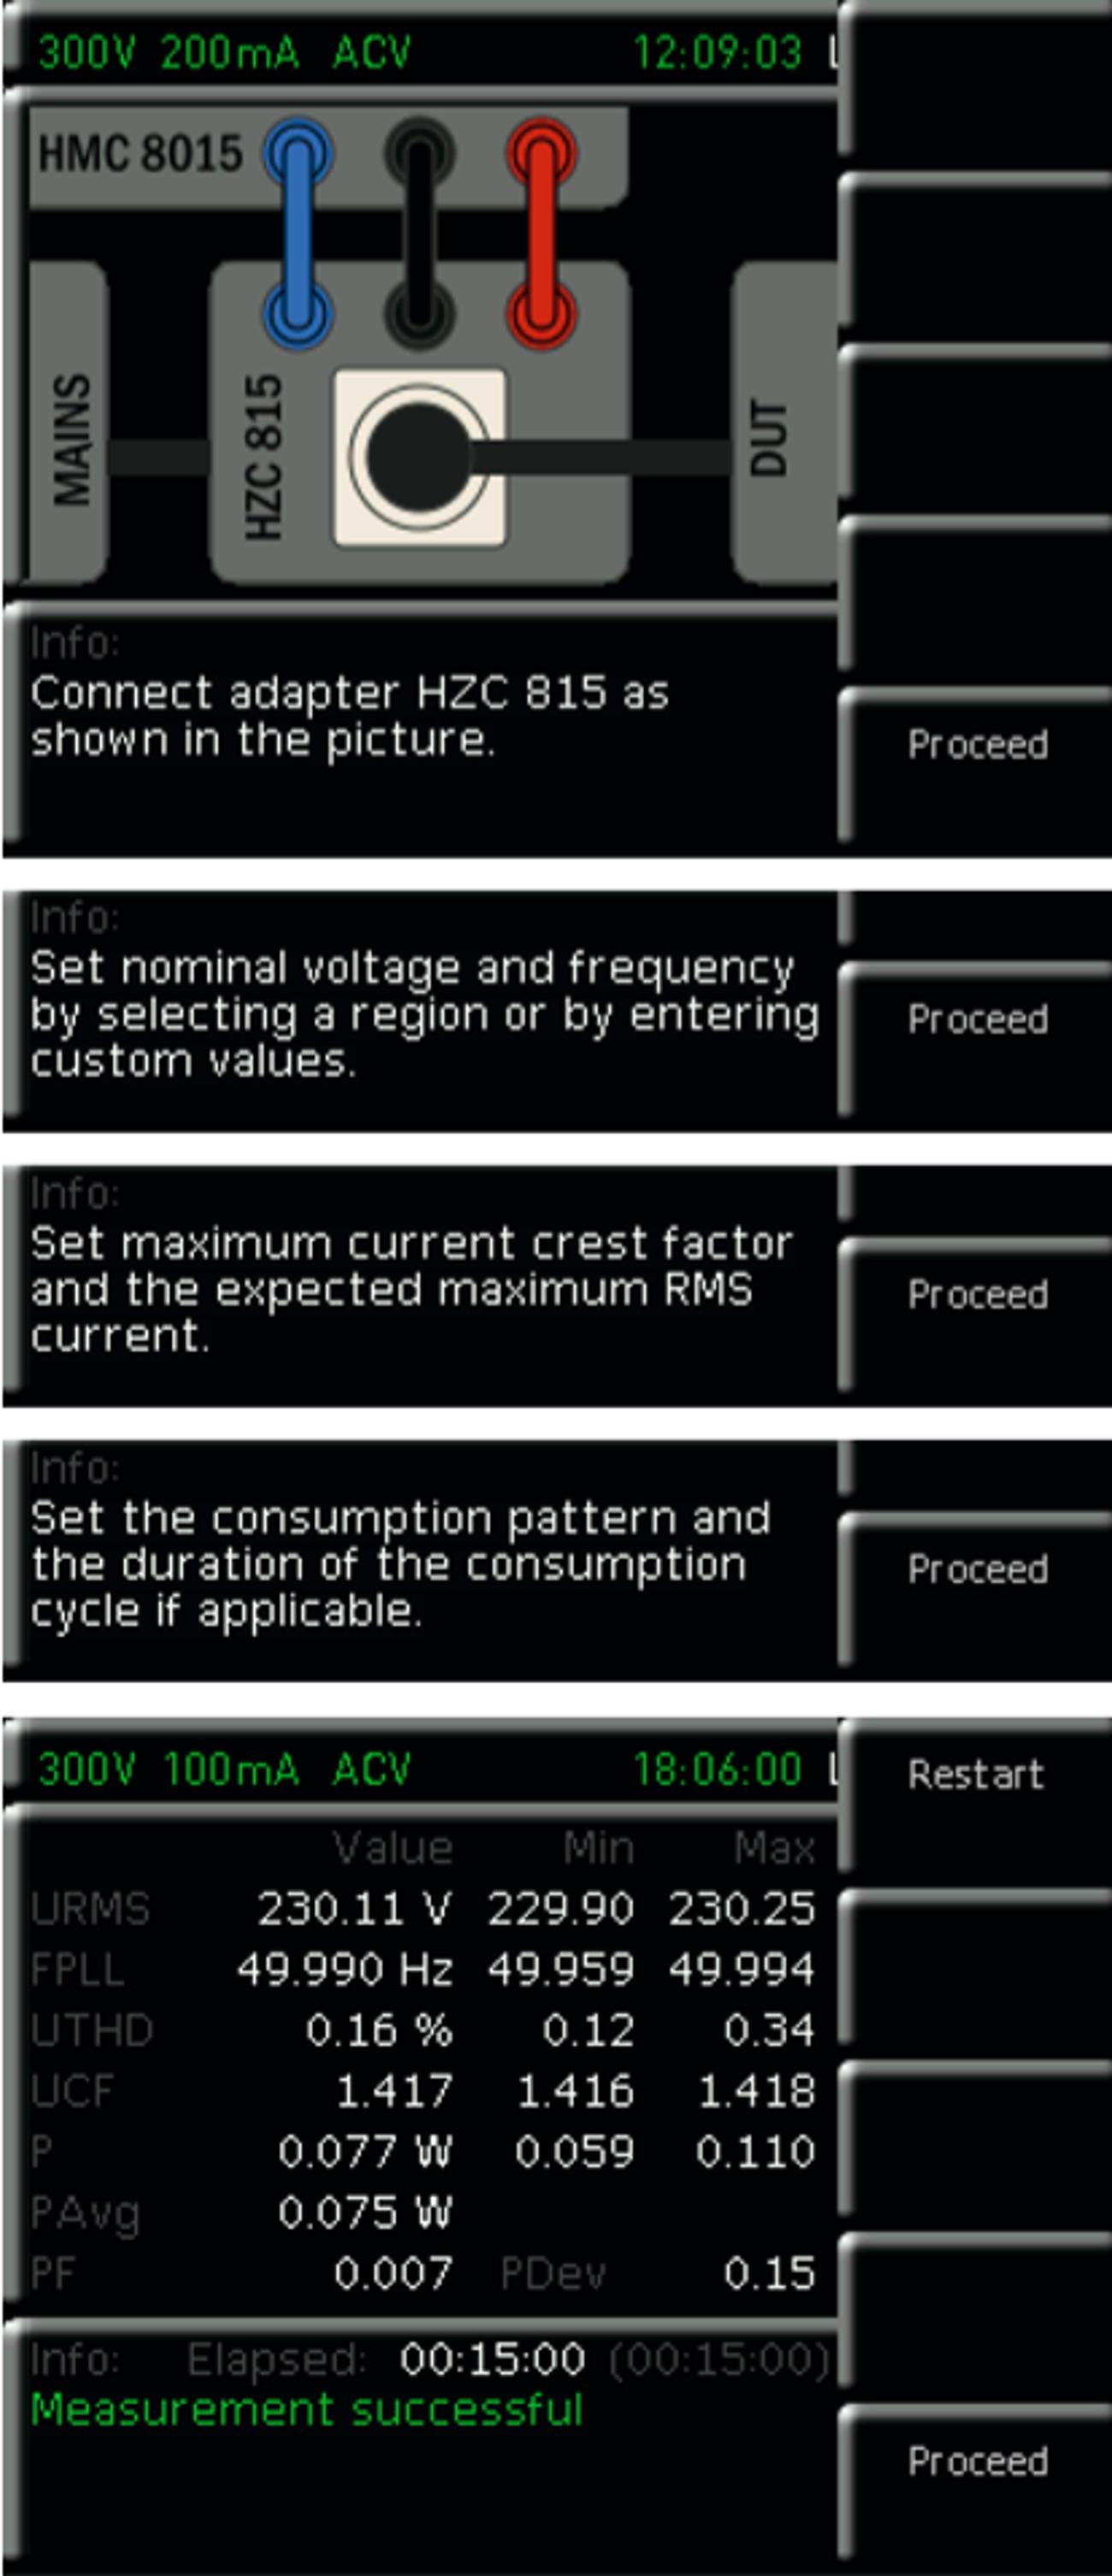 measurement-standby-power-consumption_ac_5216-1186-92_02.png